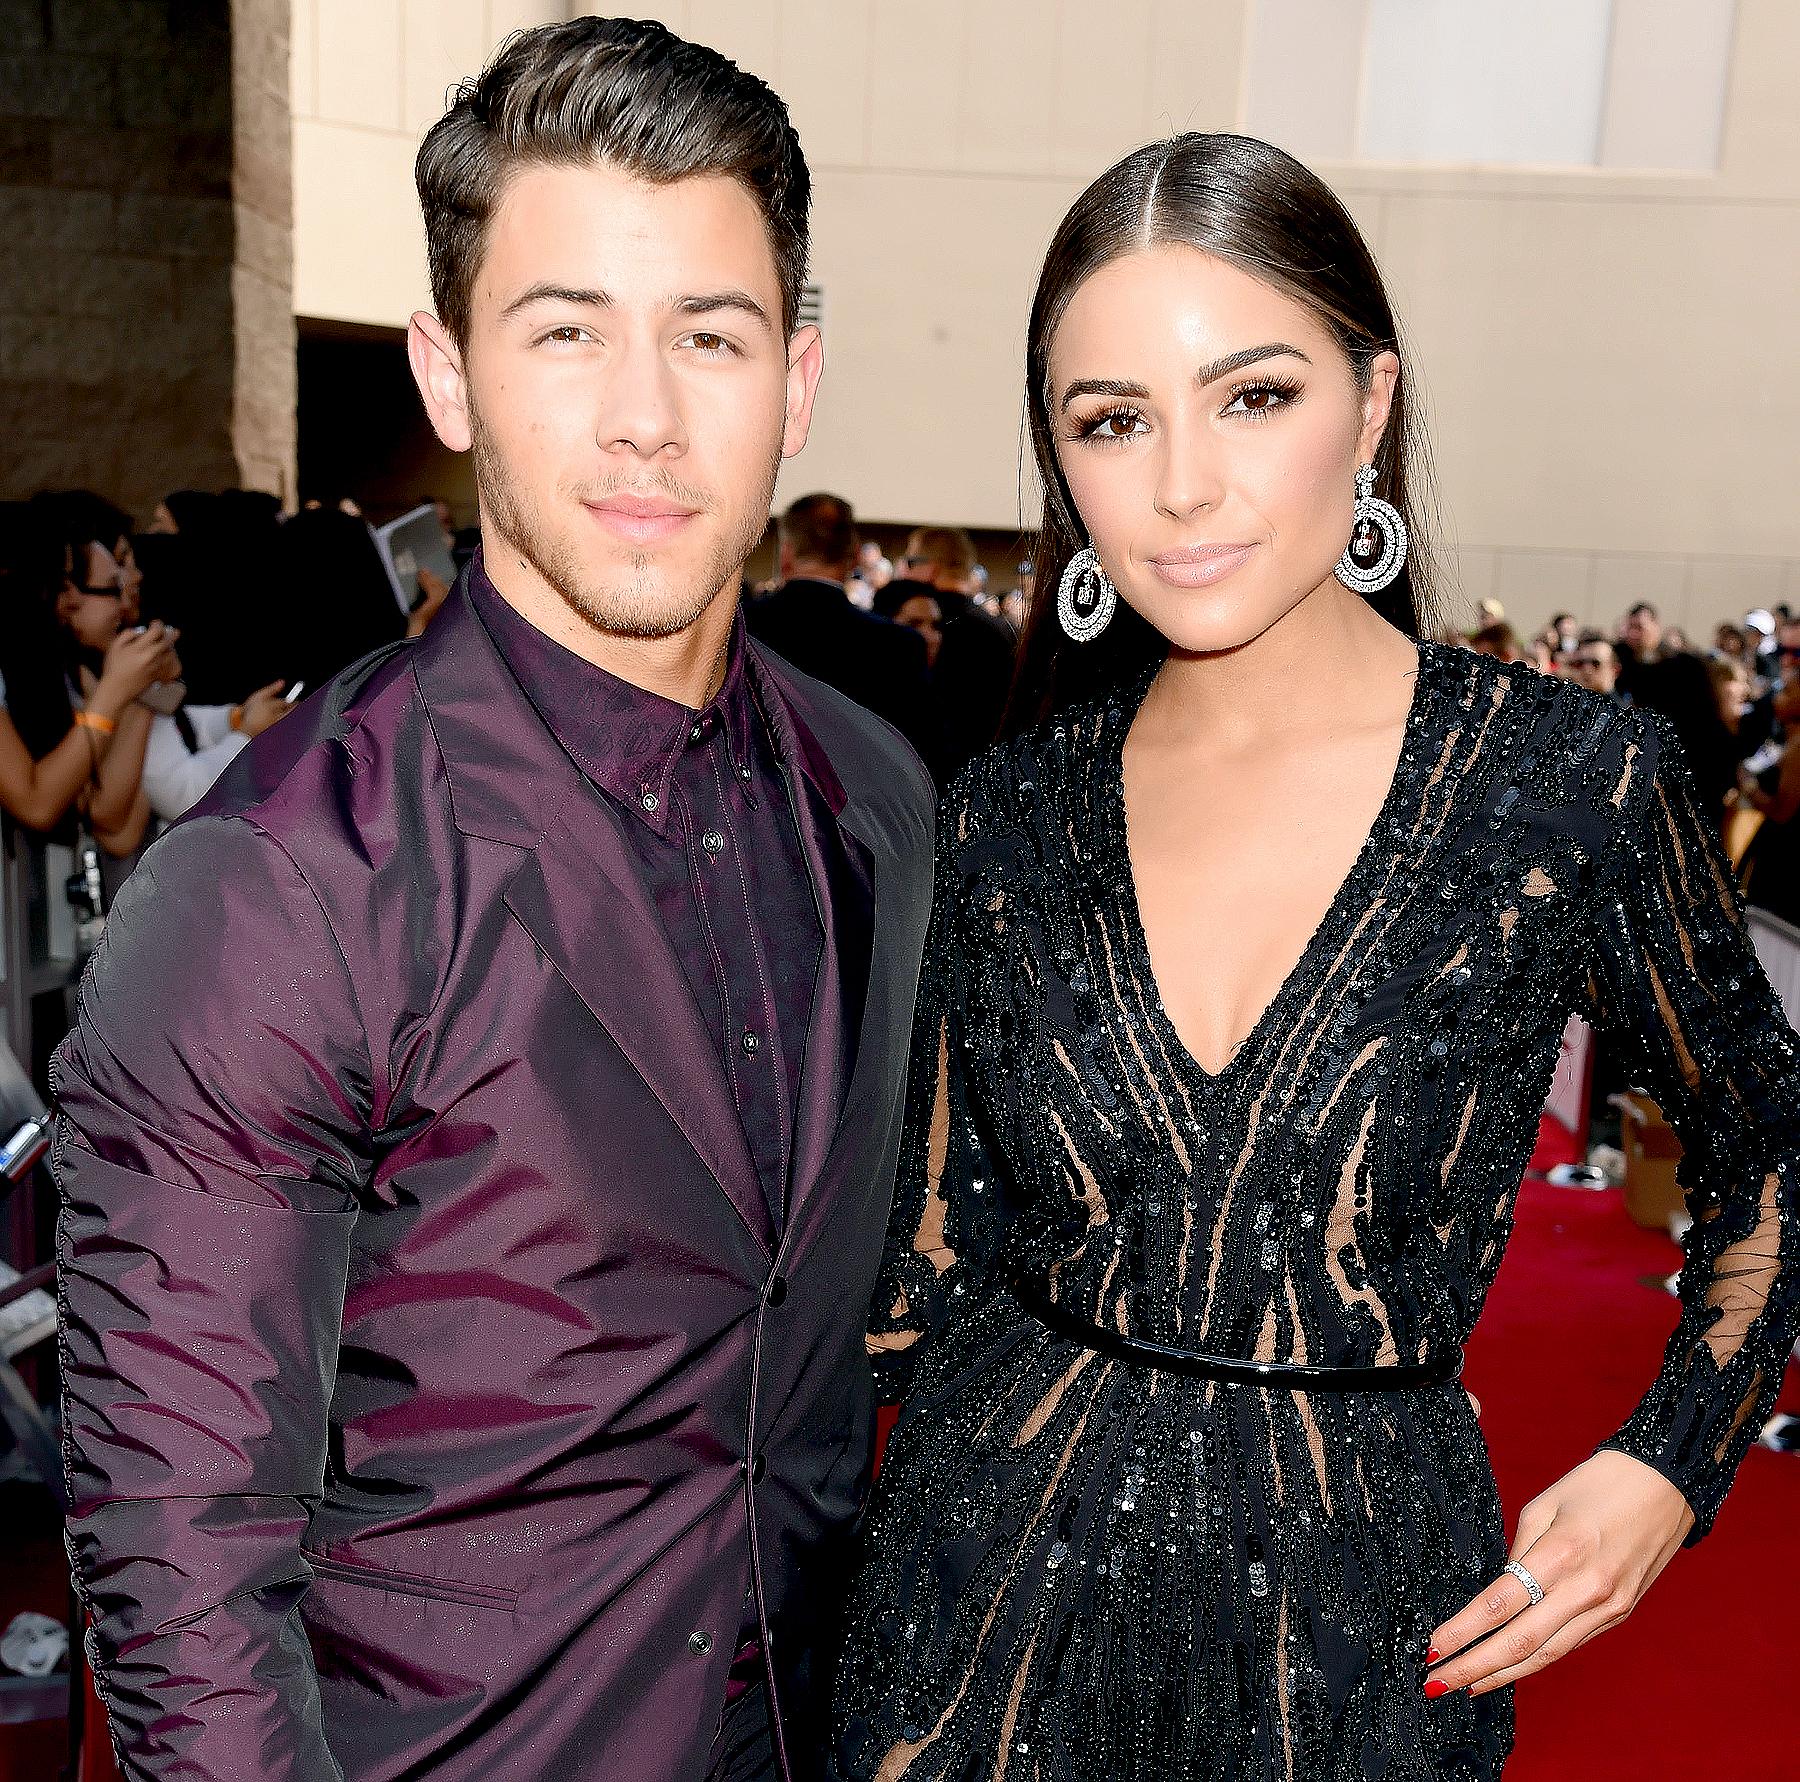 Nick Jonas and Olivia Culpo attend the 2015 Billboard Music Awards.